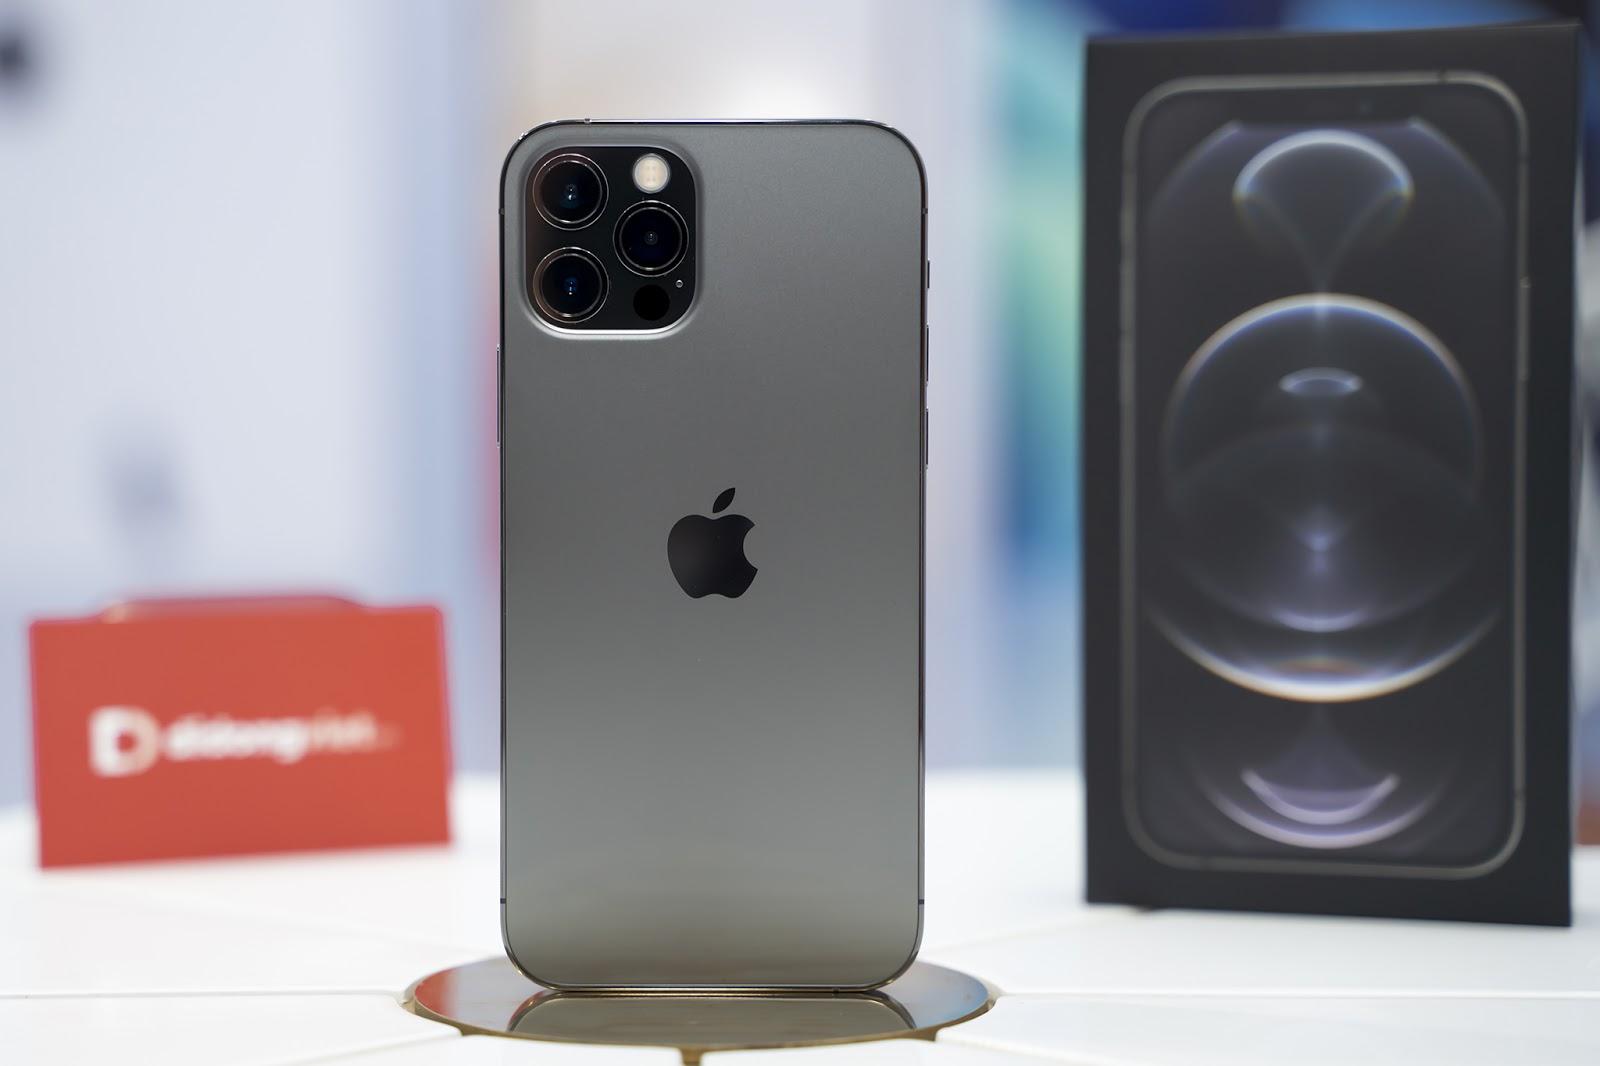 iPhone 12 Pro, 12 Pro Max giảm đến 6,2 triệu dịp cận Tết 3